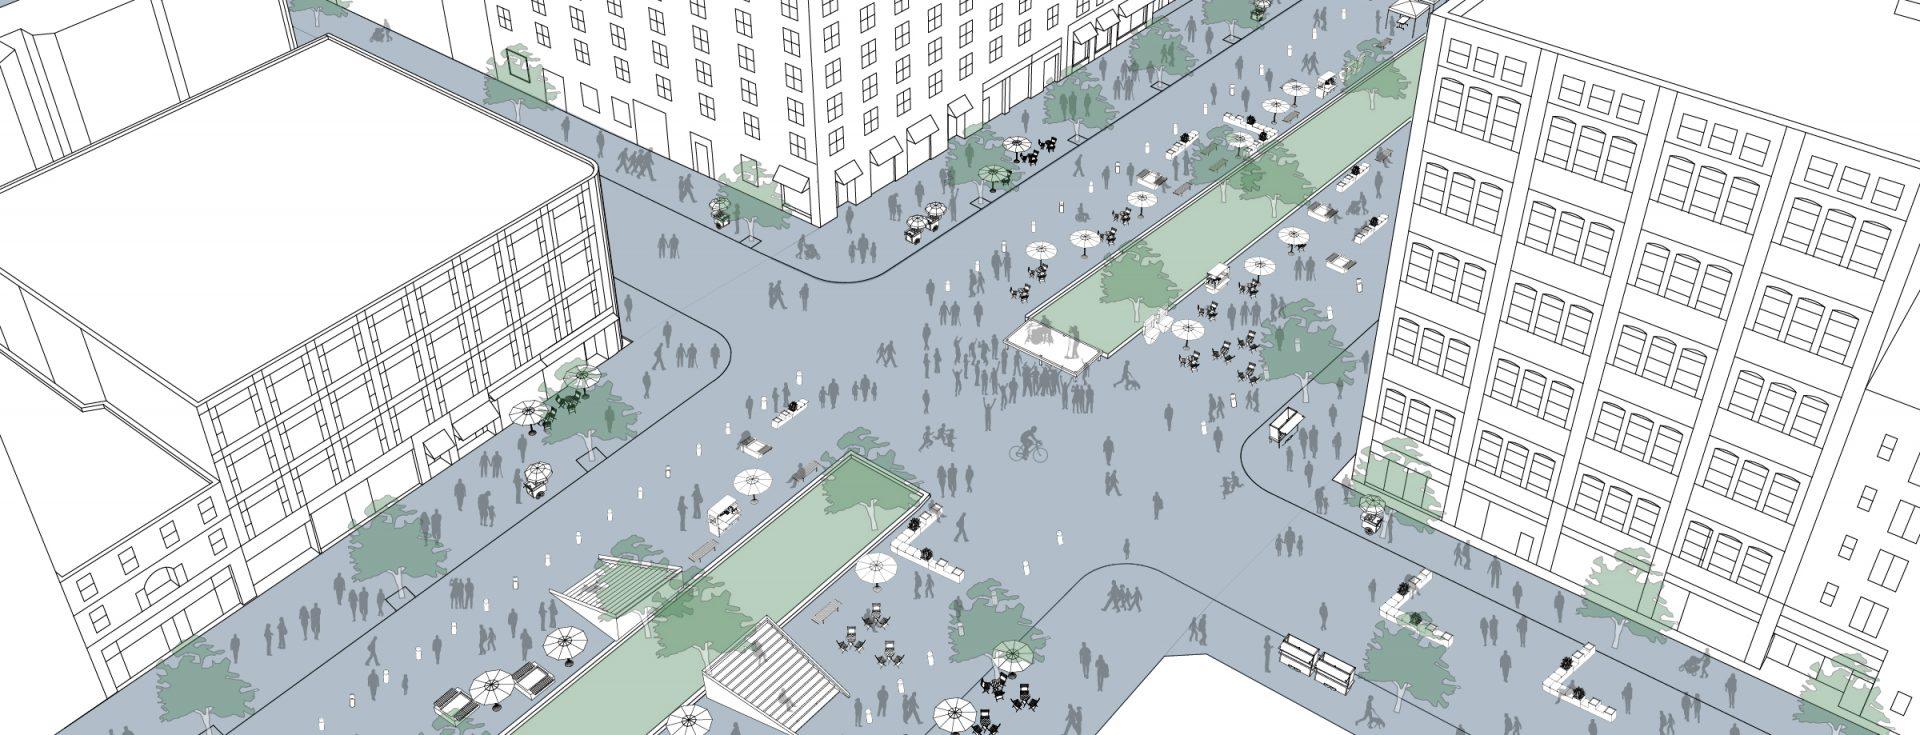 Street Plans